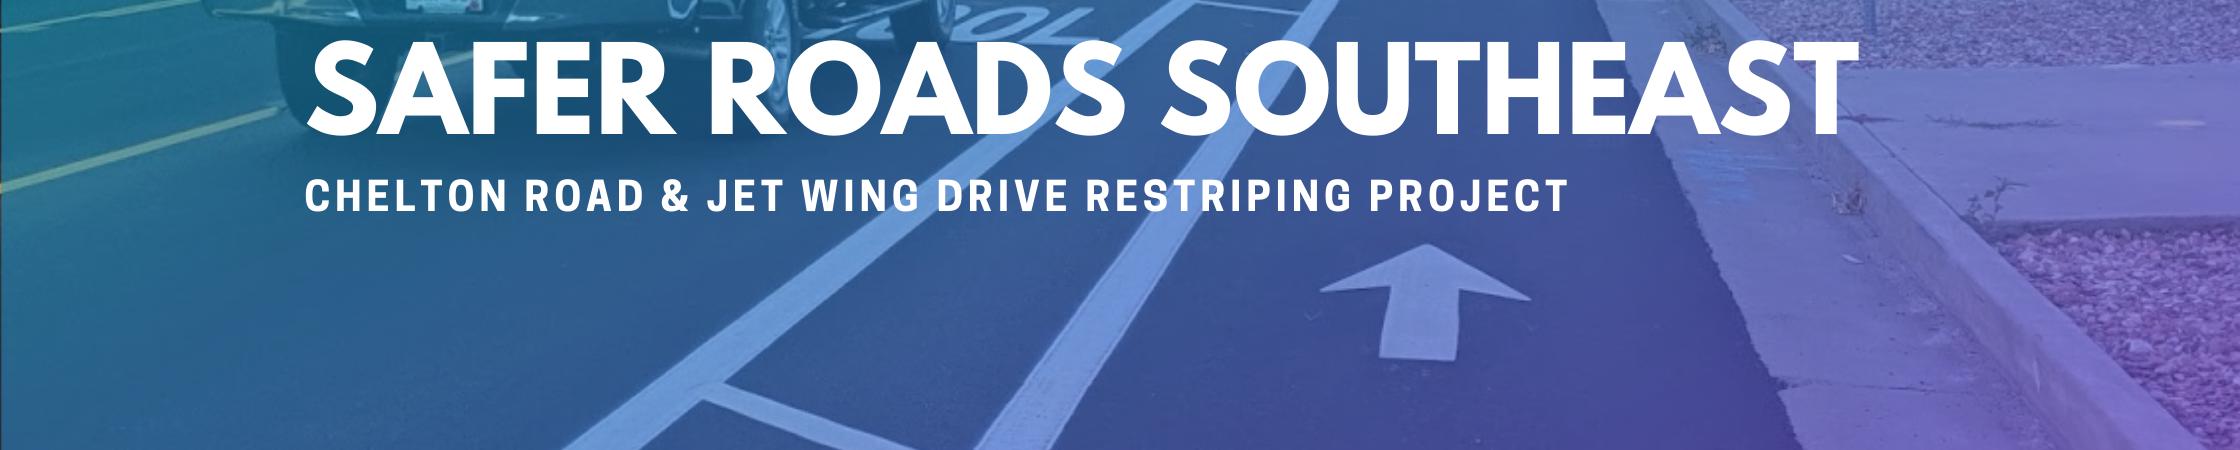 Safer Roads Southeast